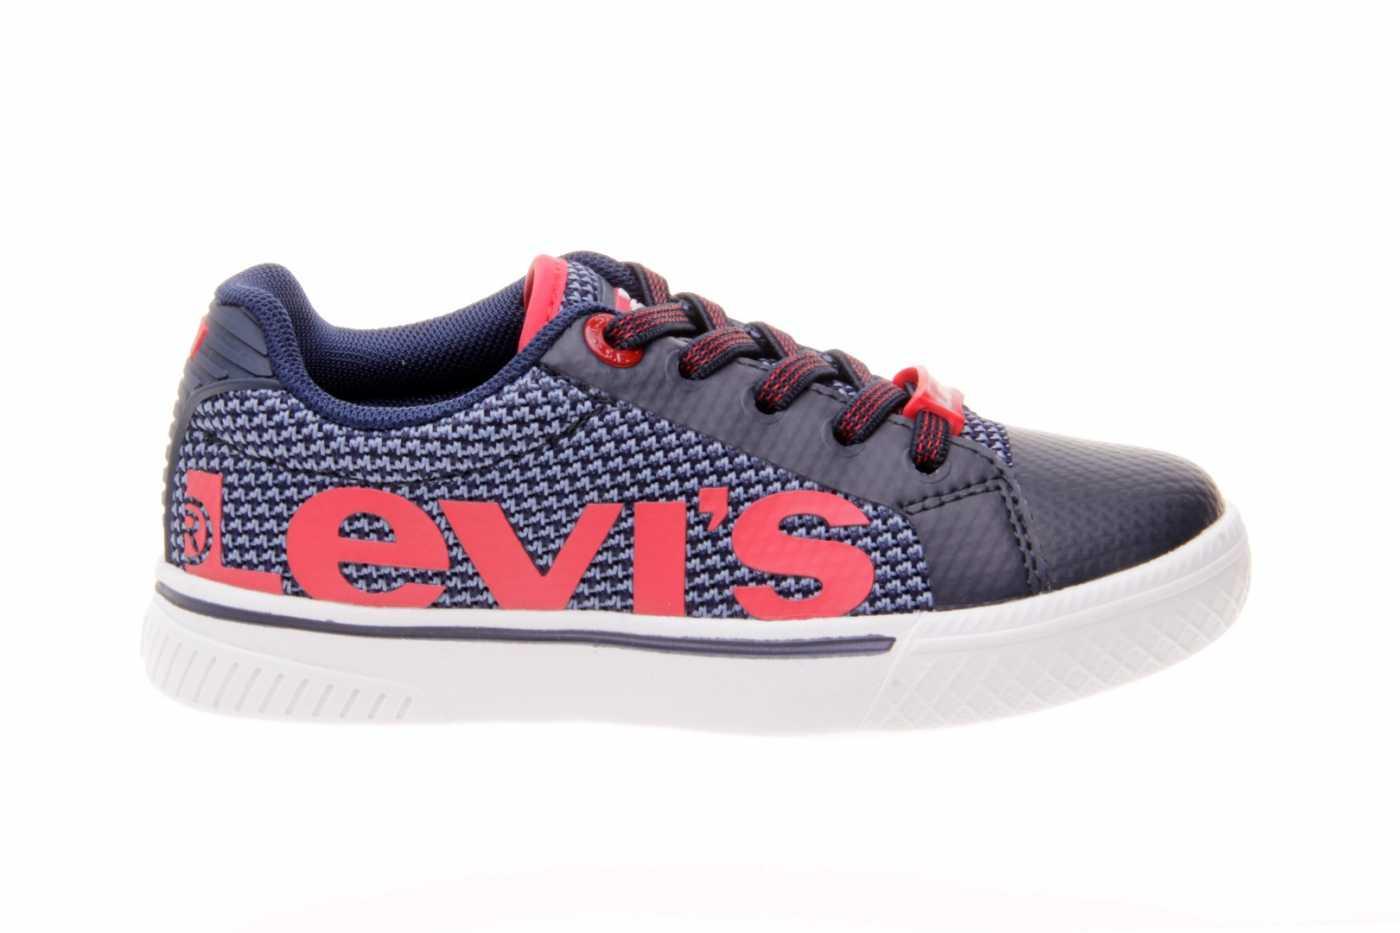 4dab883b Comprar zapato tipo JOVEN NIÑO estilo DEPORTIVO COLOR AZUL MARINO ...